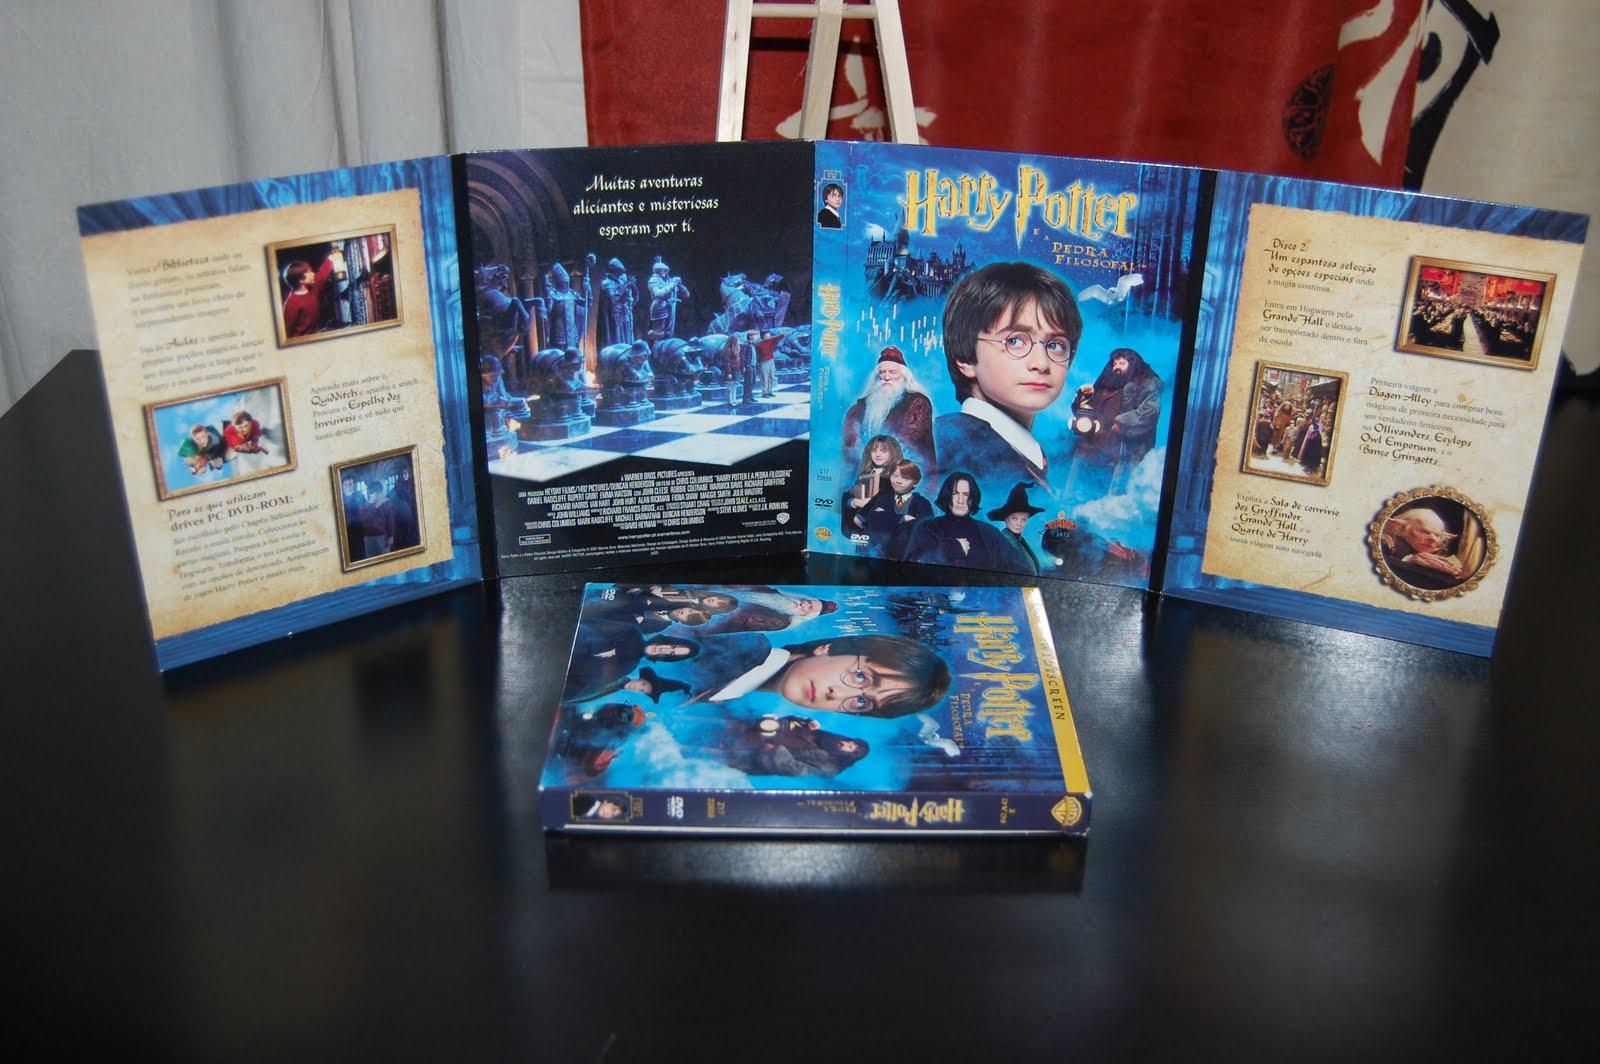 Harry Potter É A Pedra Filosofal with regard to i love world movies collection . . .: harry potter e a pedra